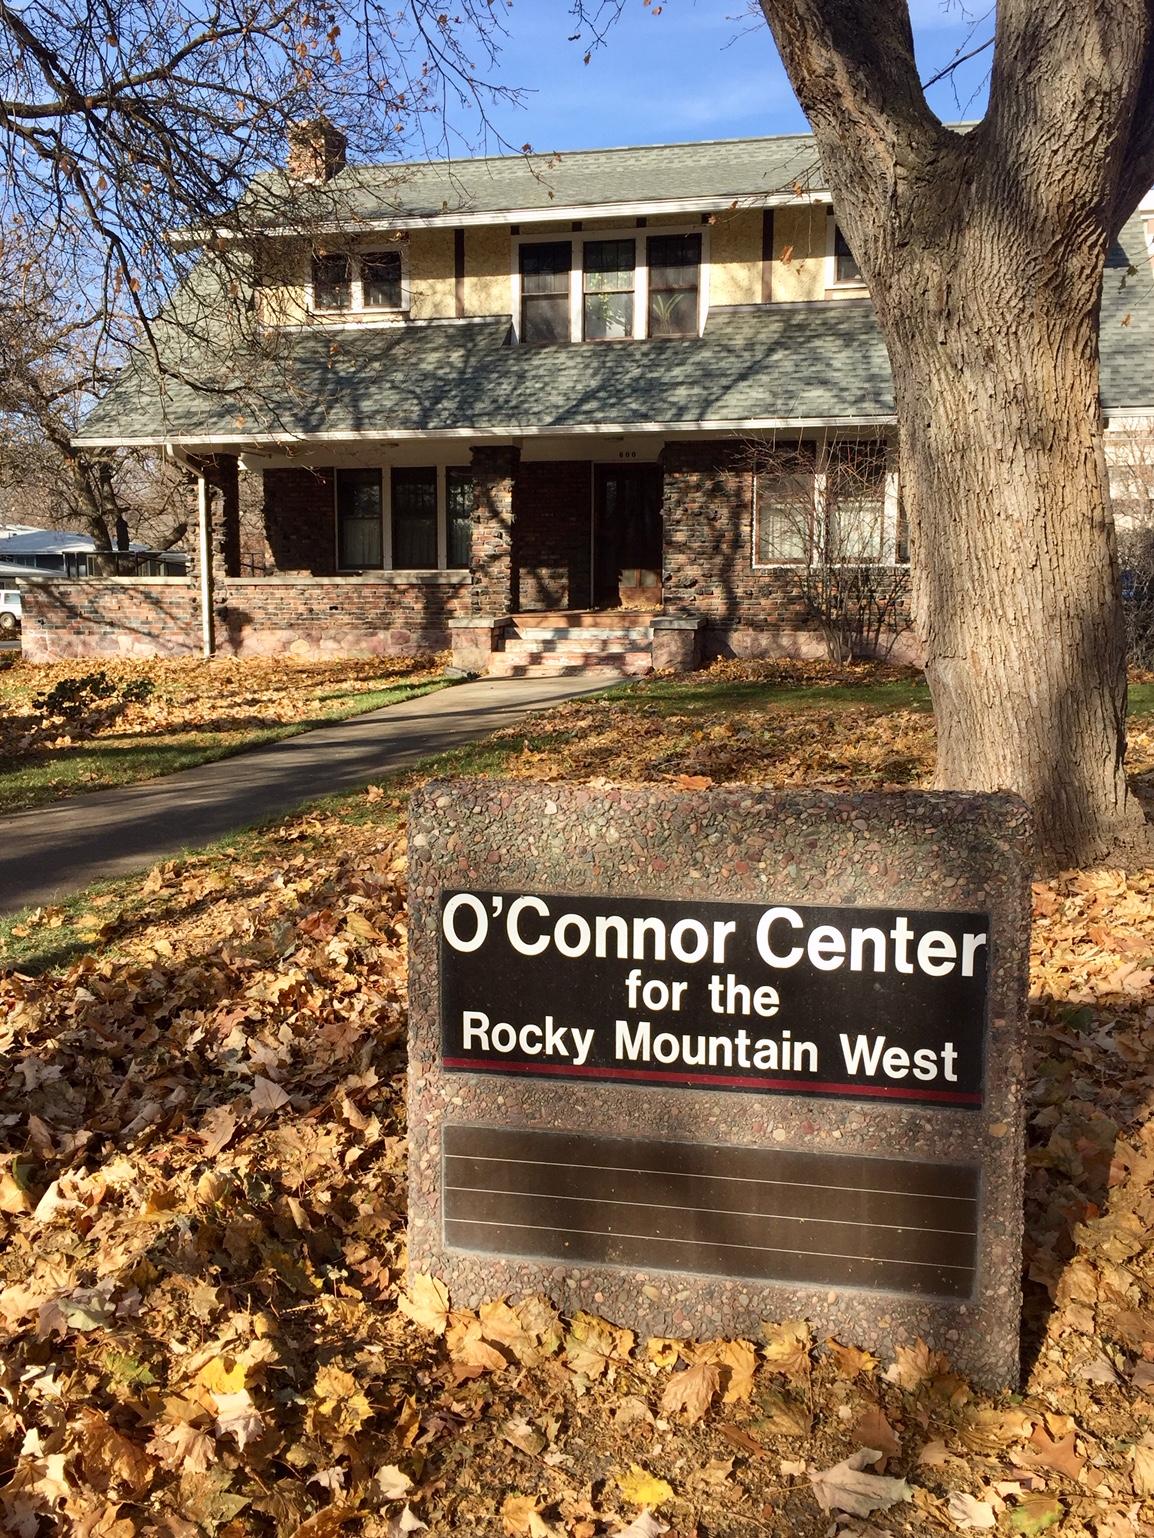 Rockies Today Brings Regional Context to Montana News